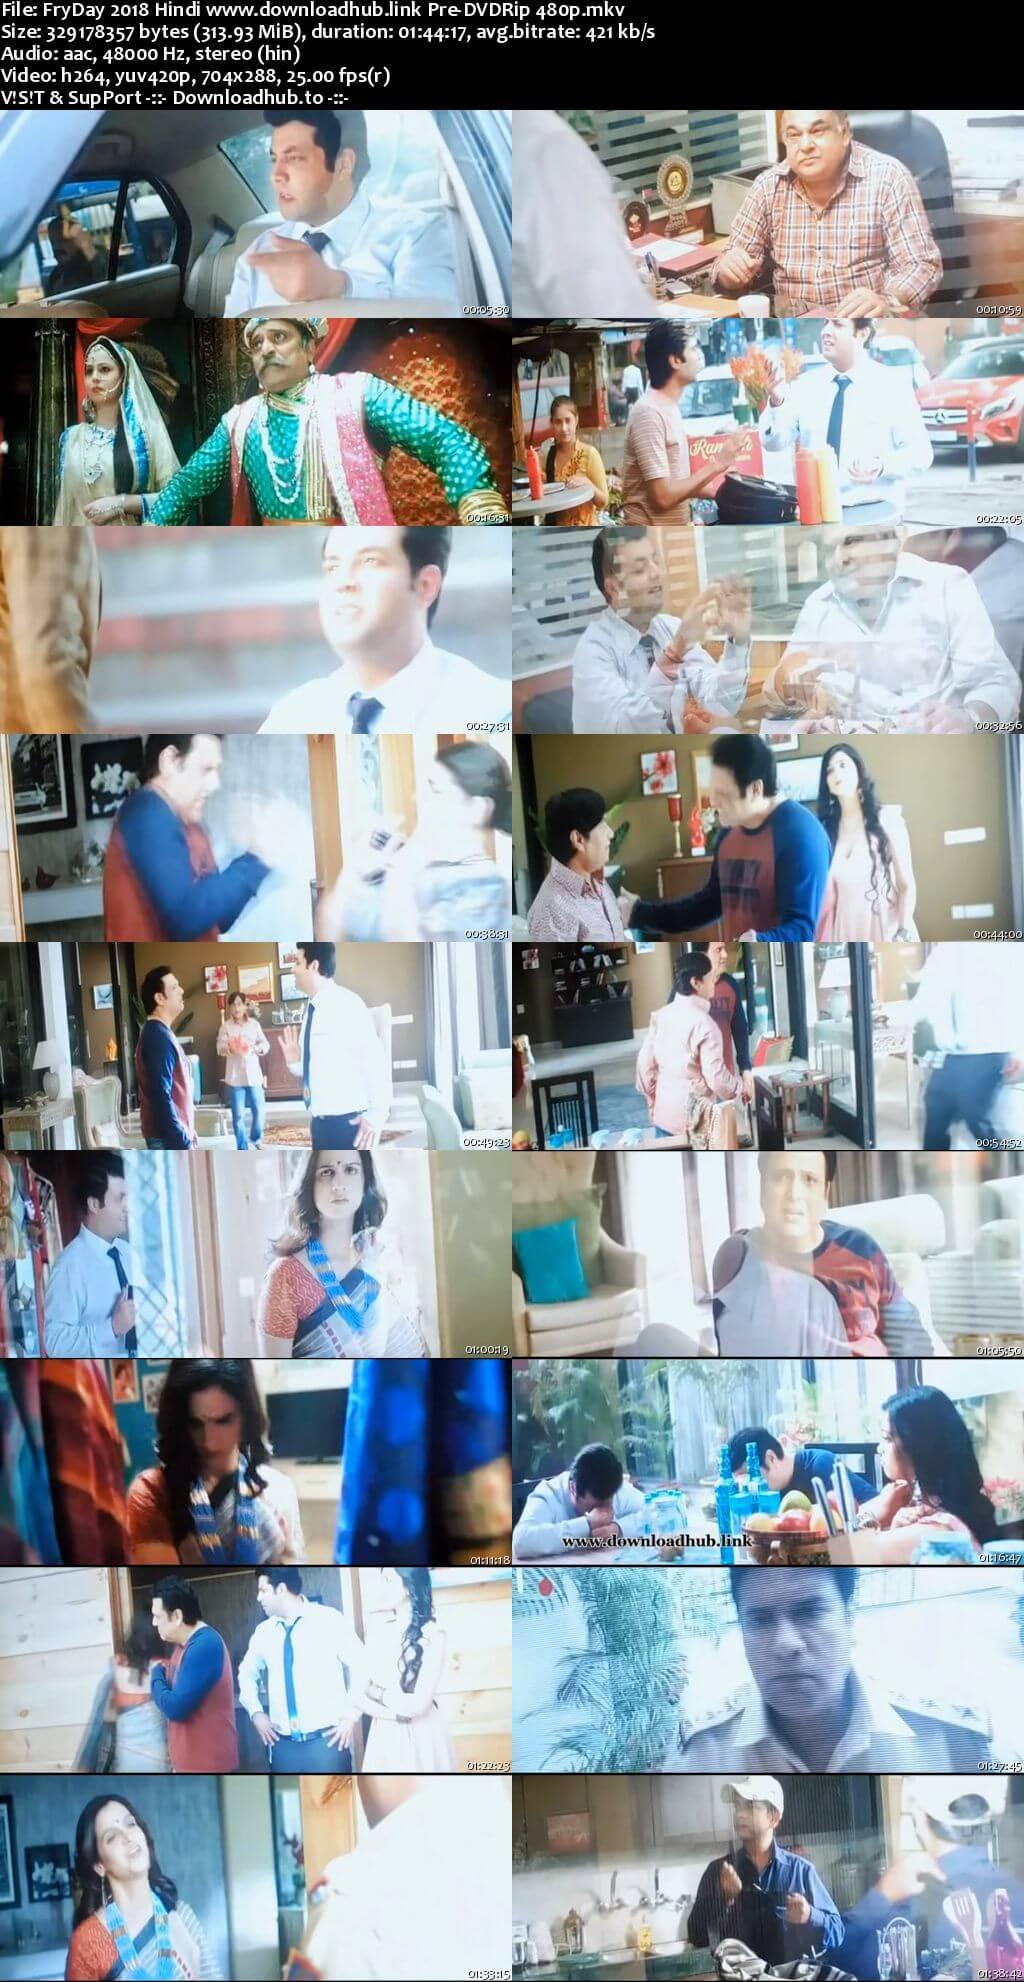 FryDay 2018 Hindi 300MB Pre-DVDRip 480p